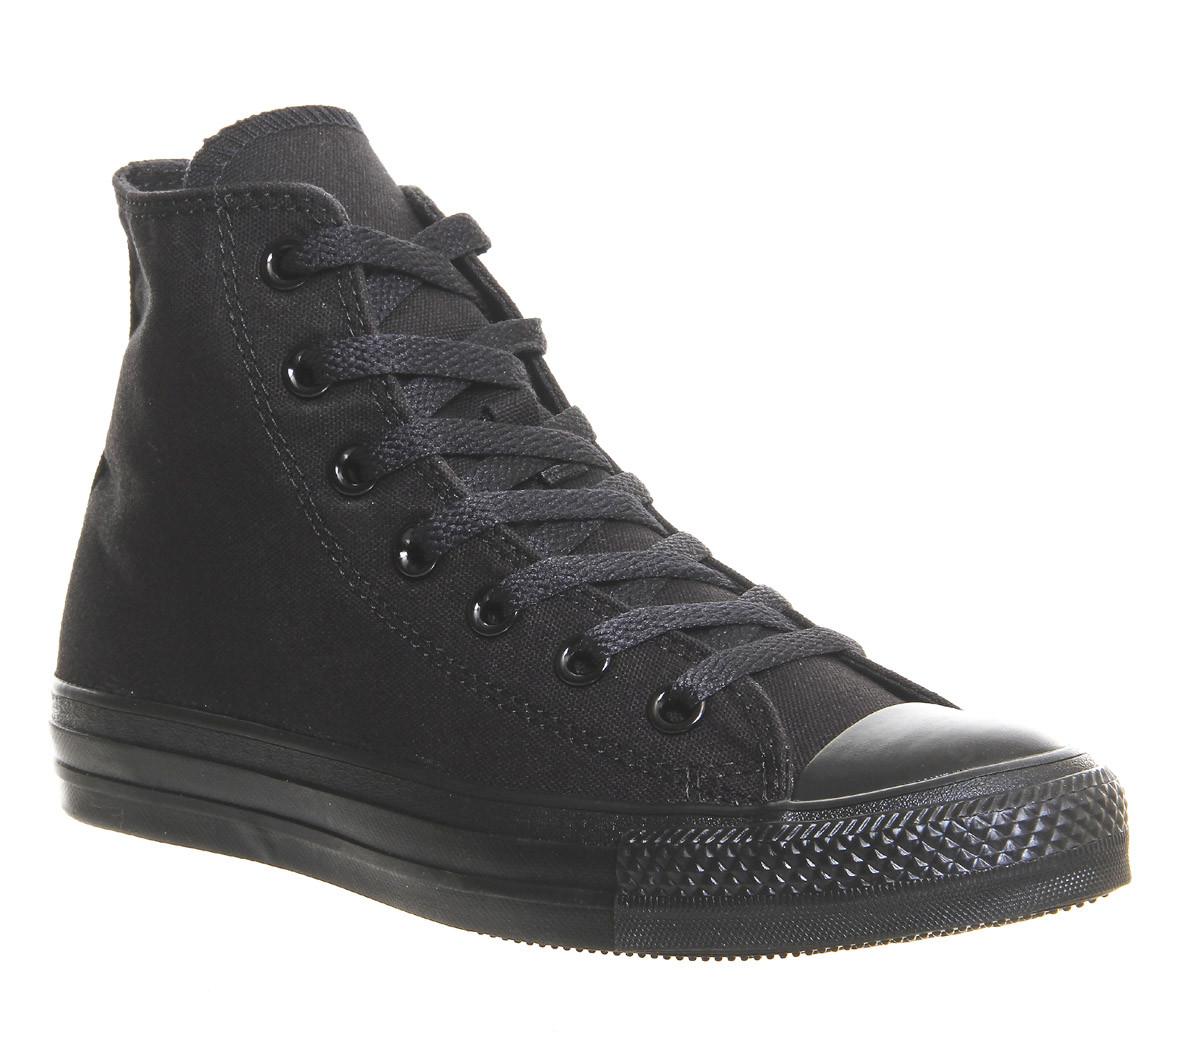 e7fc6f23 Кед Converse All Star High Black Monochrome (35-44р.) на любой вкус ...